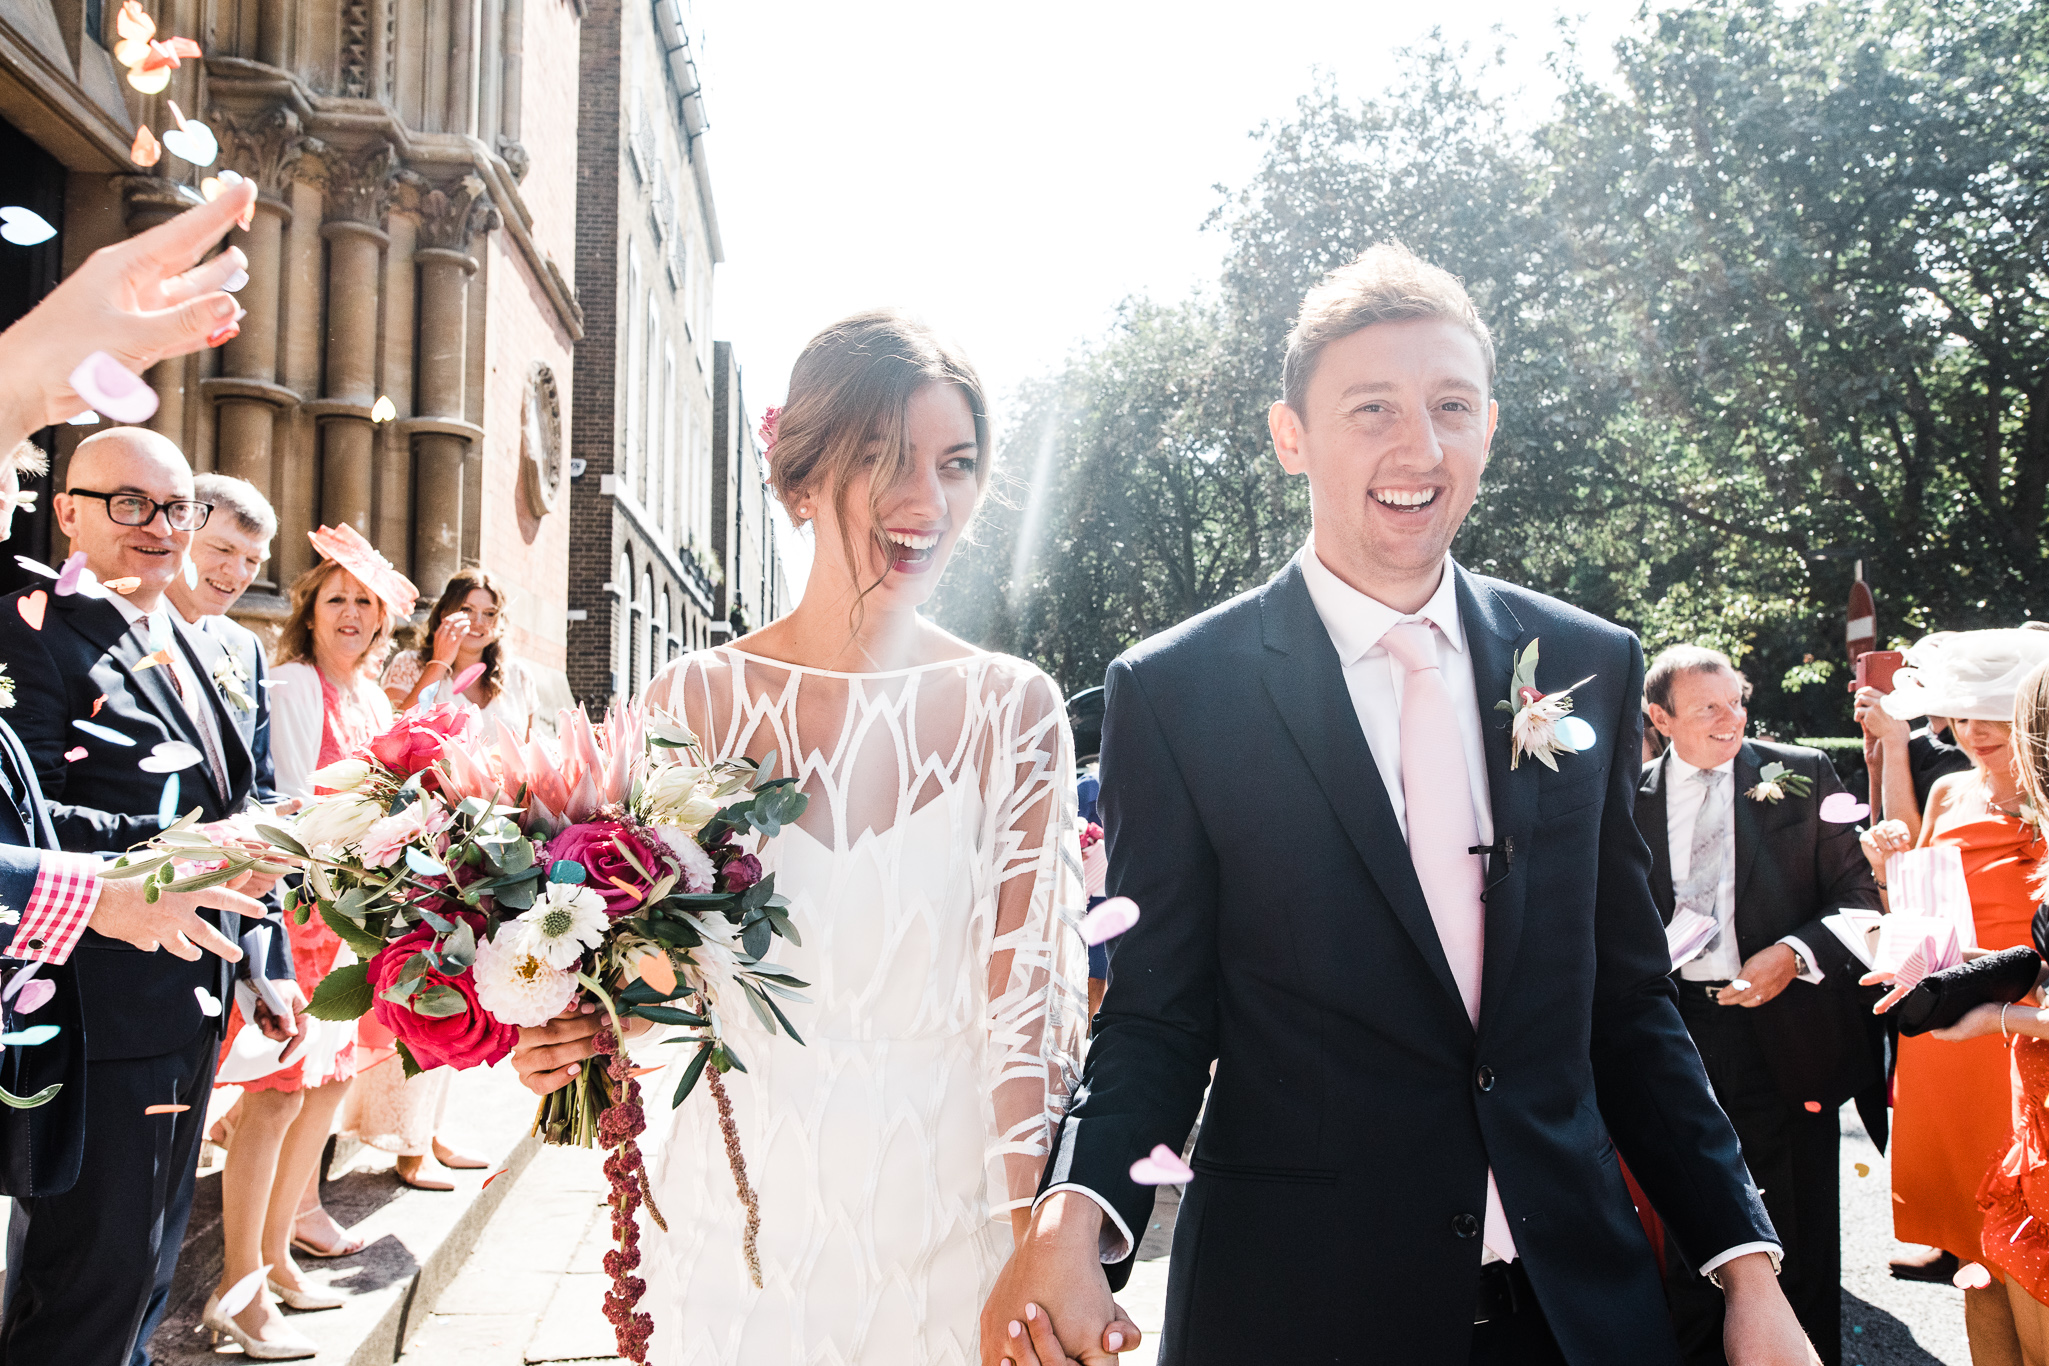 Beautiful bride Natasha wore a wedding dress by Halfpenny London